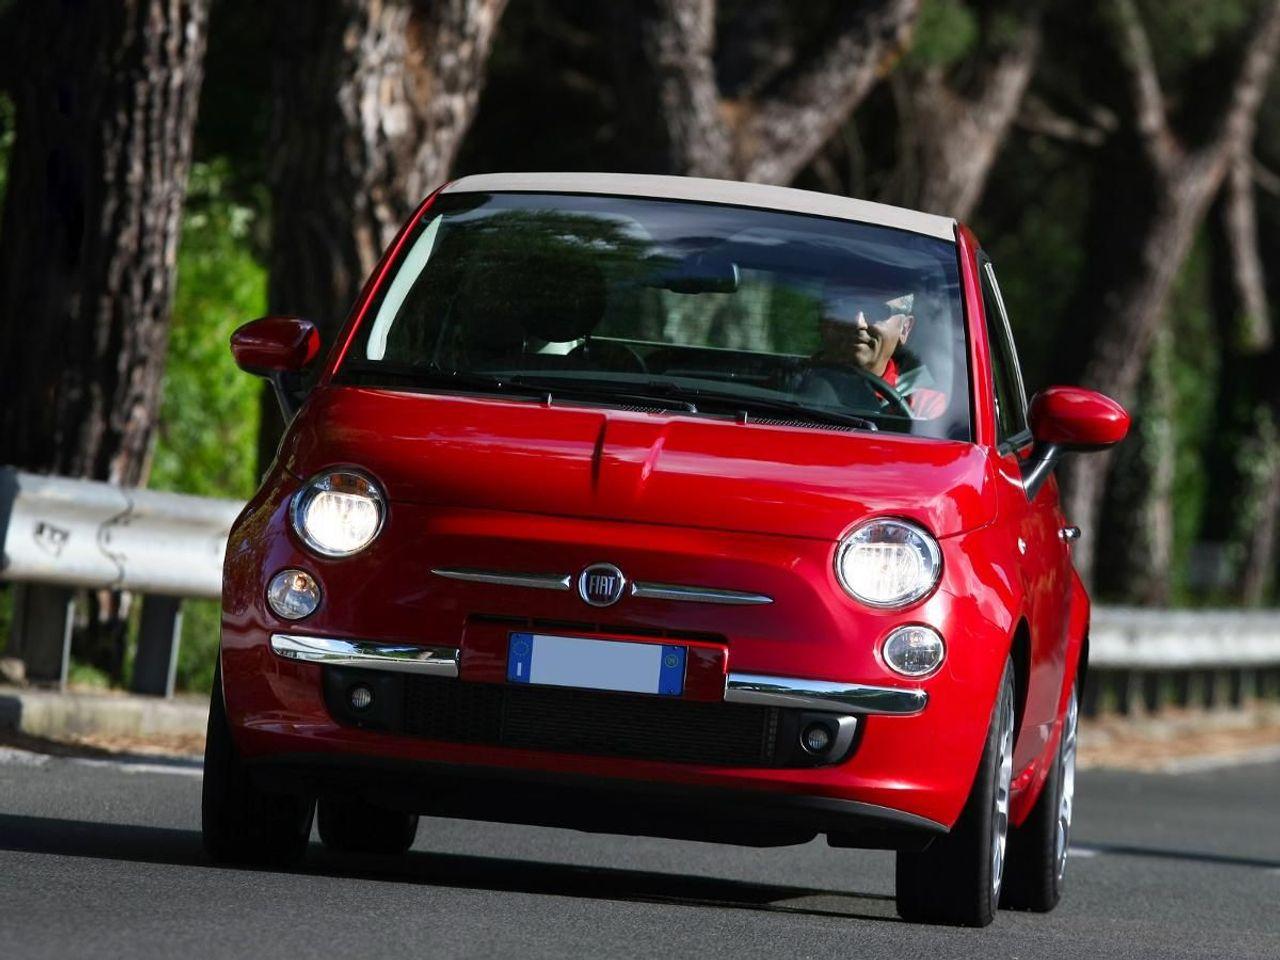 Fiat 500C convertible